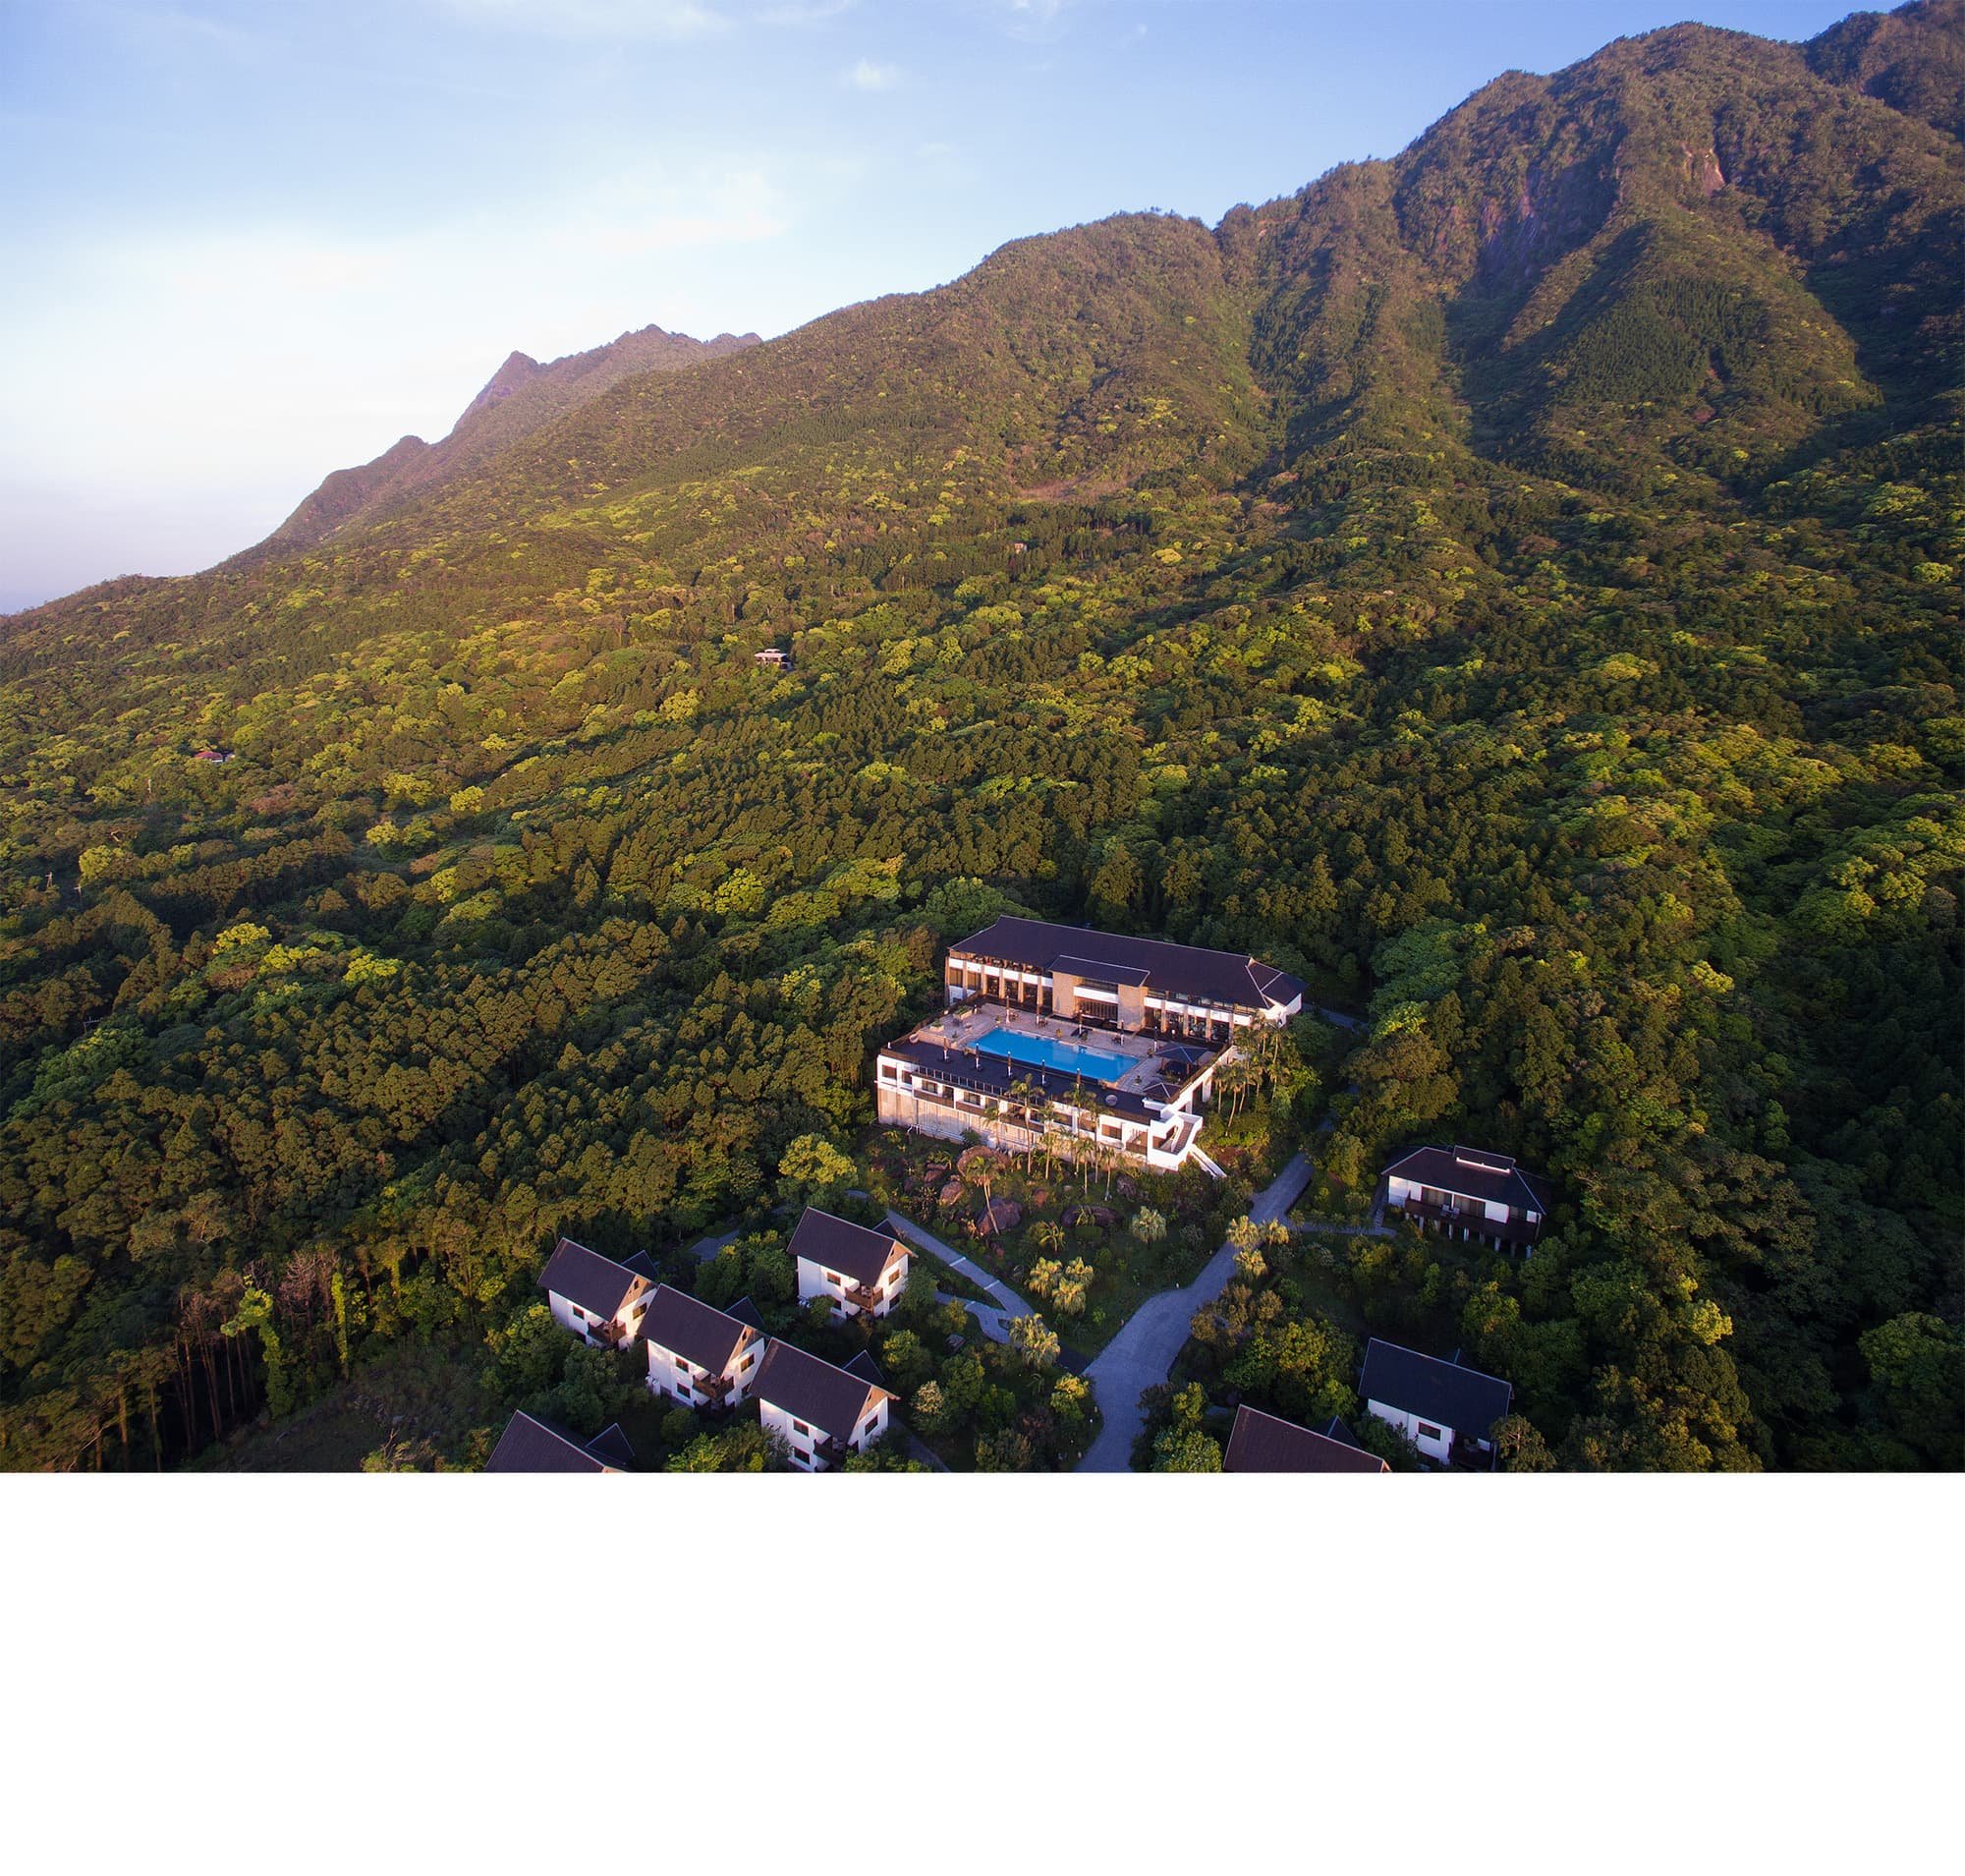 「sankara hotel&spa YAKUSHIMA サンカラホテル&スパ屋久島」(日本・鹿児島県)壮大な自然の森に位置する